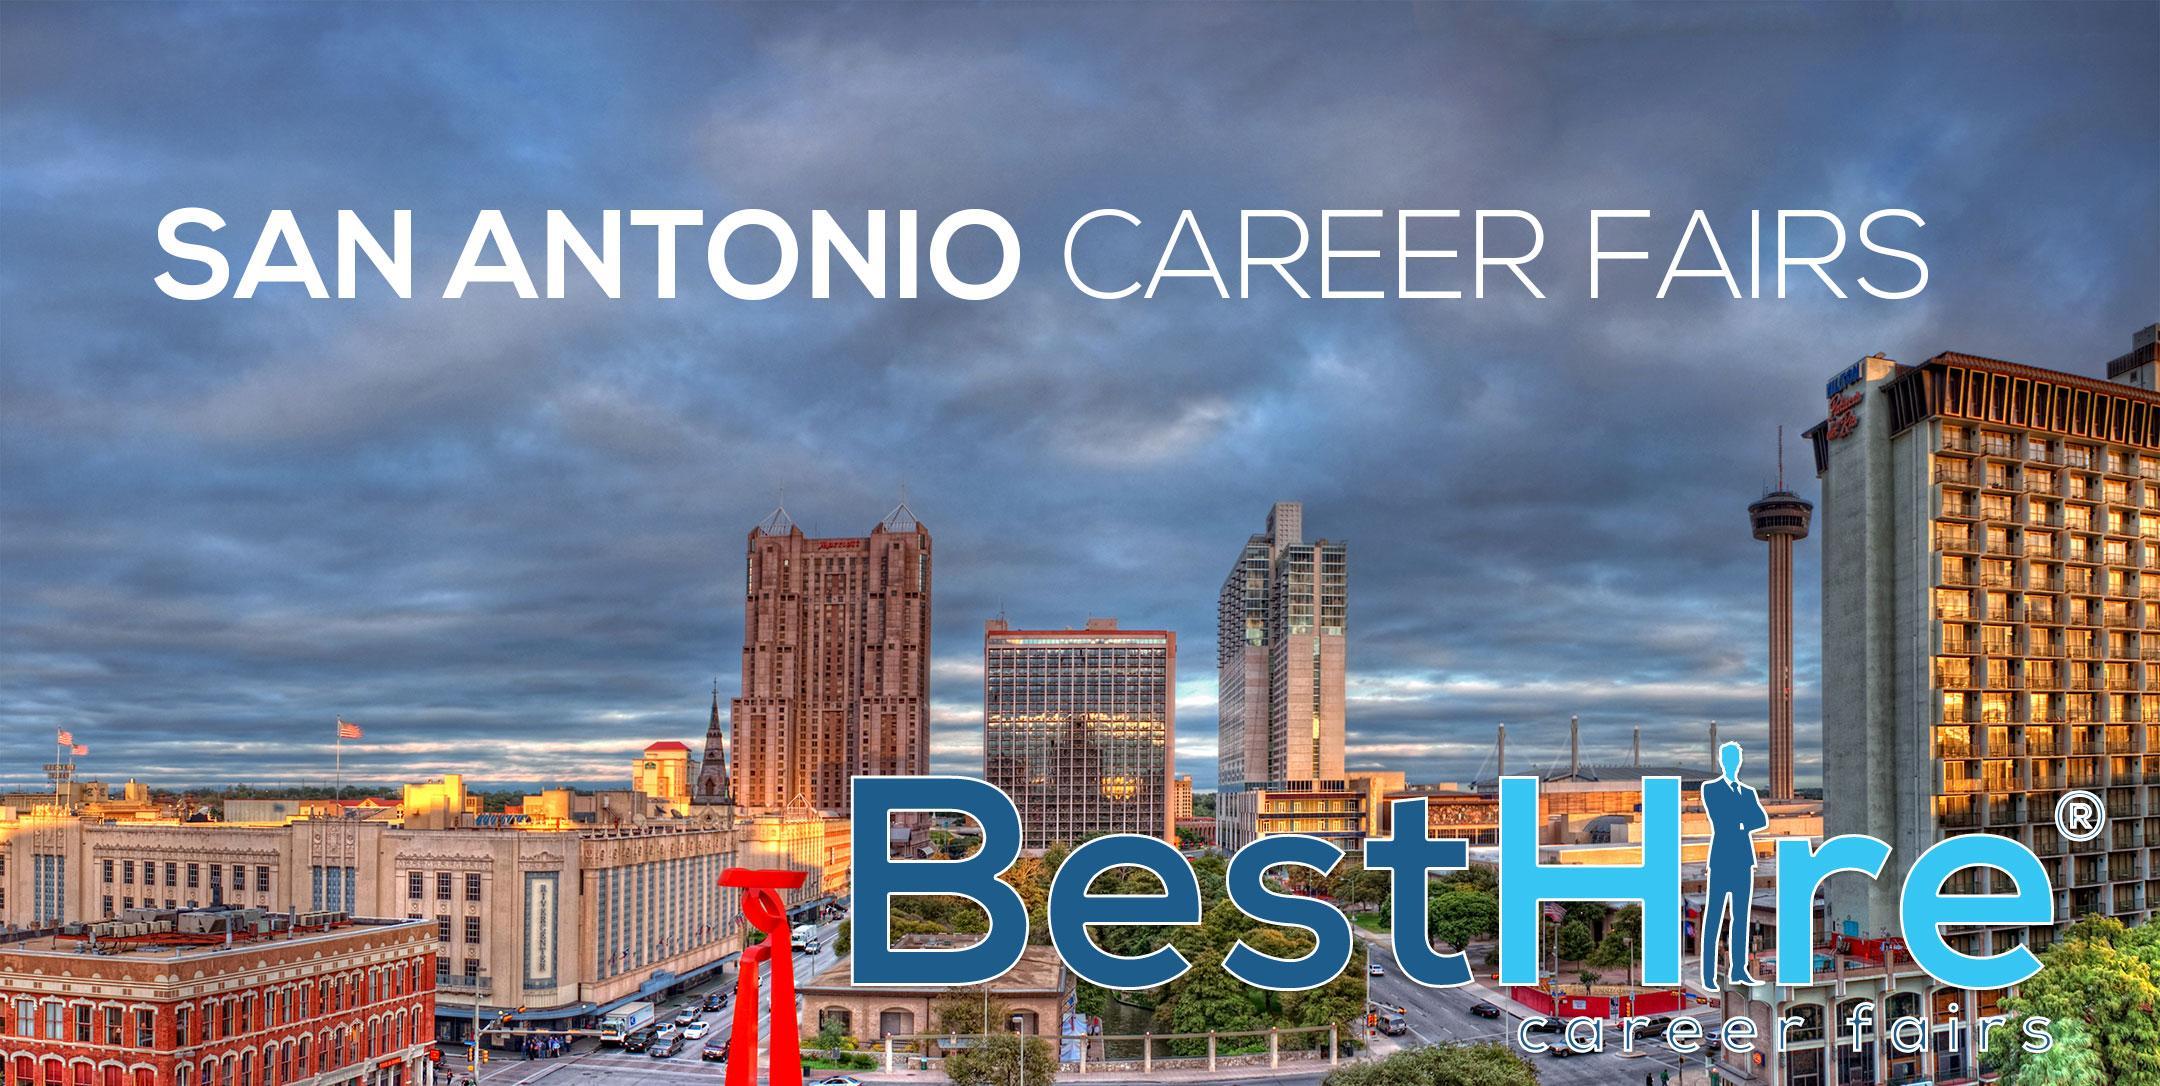 San Antonio Career Fair September 6, 2018 - Job Fairs & Hiring Events in San Antonio TX